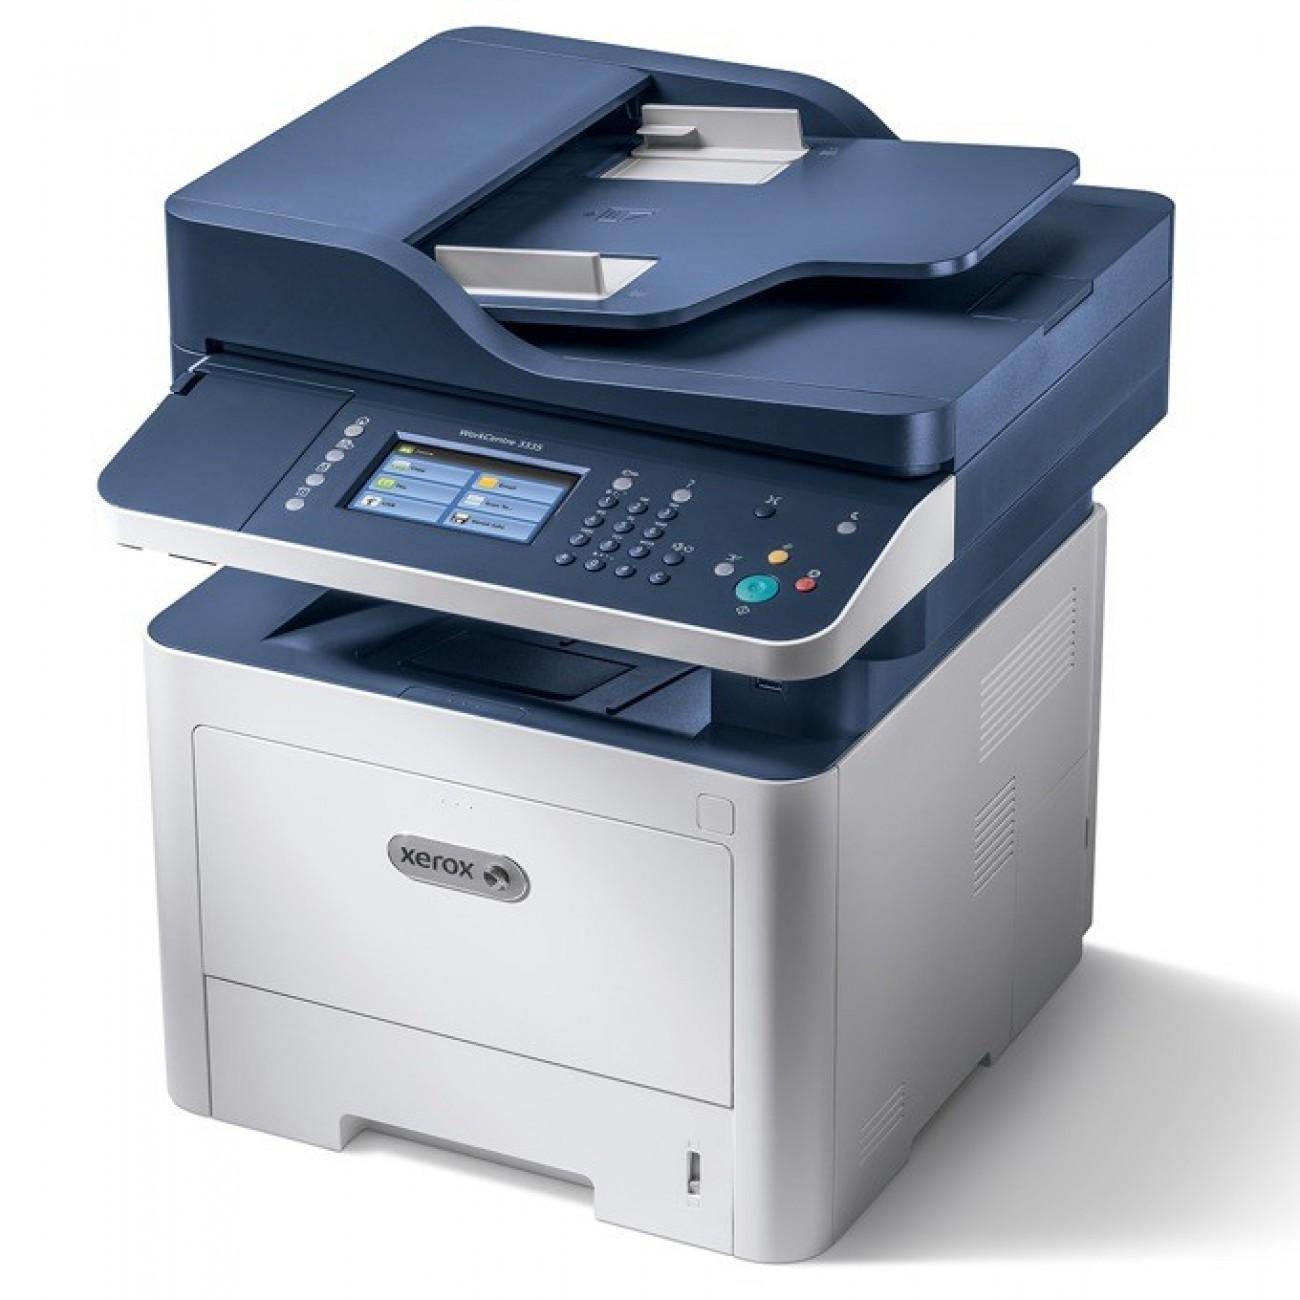 Xerox WorkCentre 3335/DNI, монохромен лазерен принтер/копир/скенер/факс, 1200x1200, 33стр/мин, Lan, Wi-Fi, USB в Мултифункционали и MFP -    Alleop